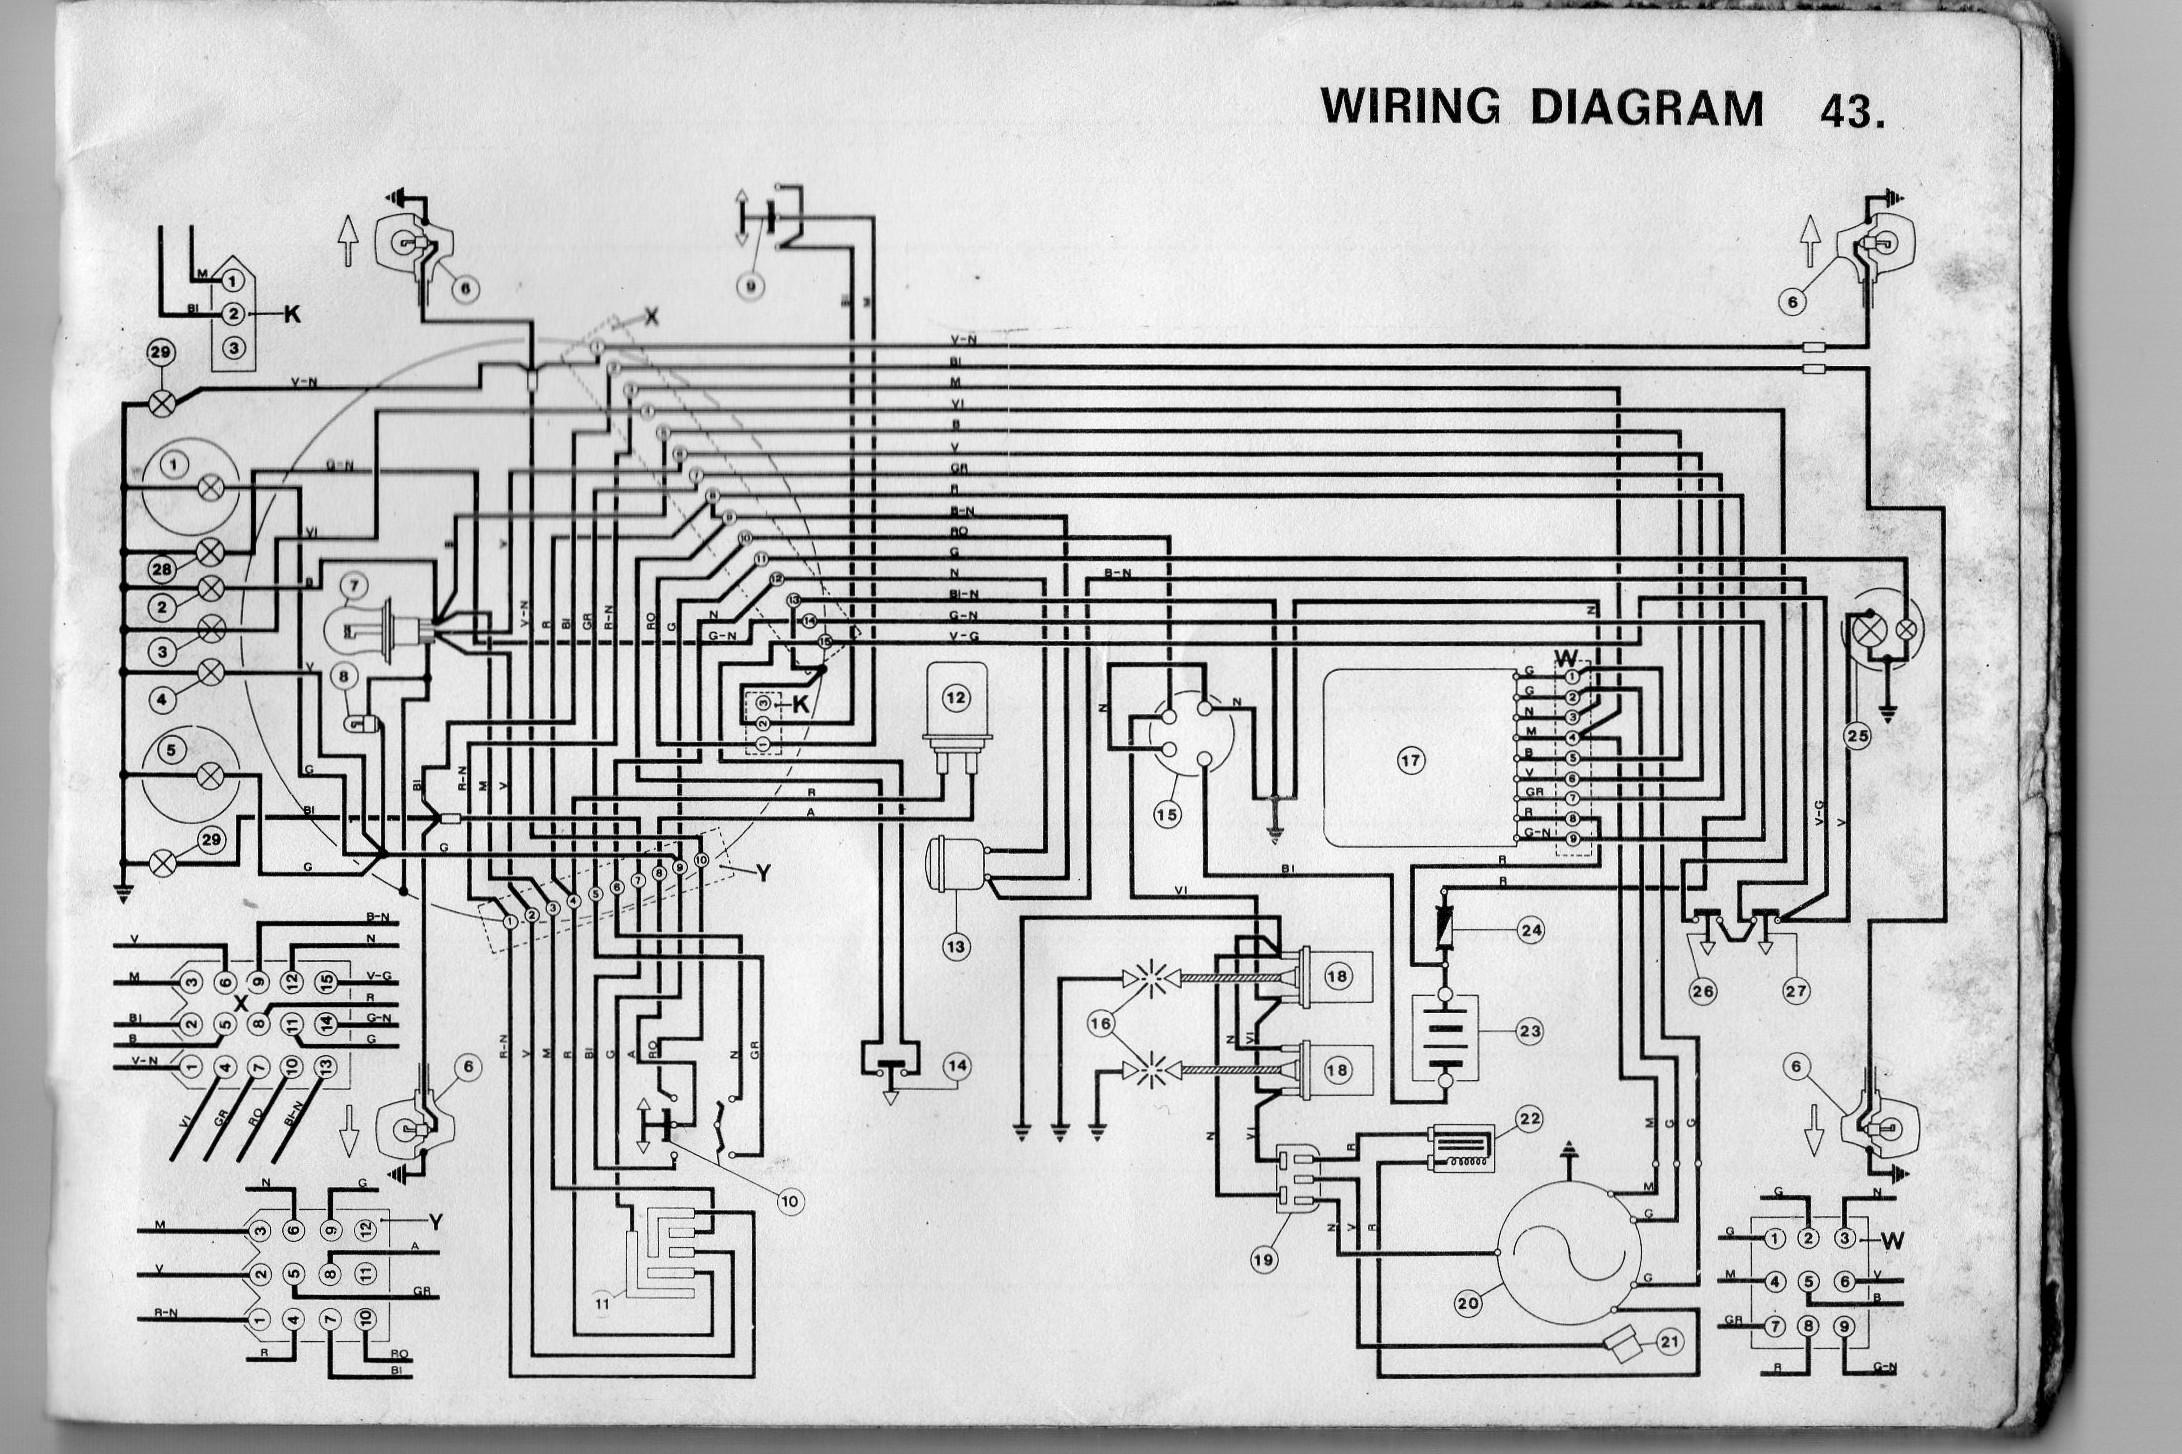 10103d1418204099 250 stroker moto guzzi 250 ts wiring diagram 250 stroker true ts 49f wiring diagram at aneh.co